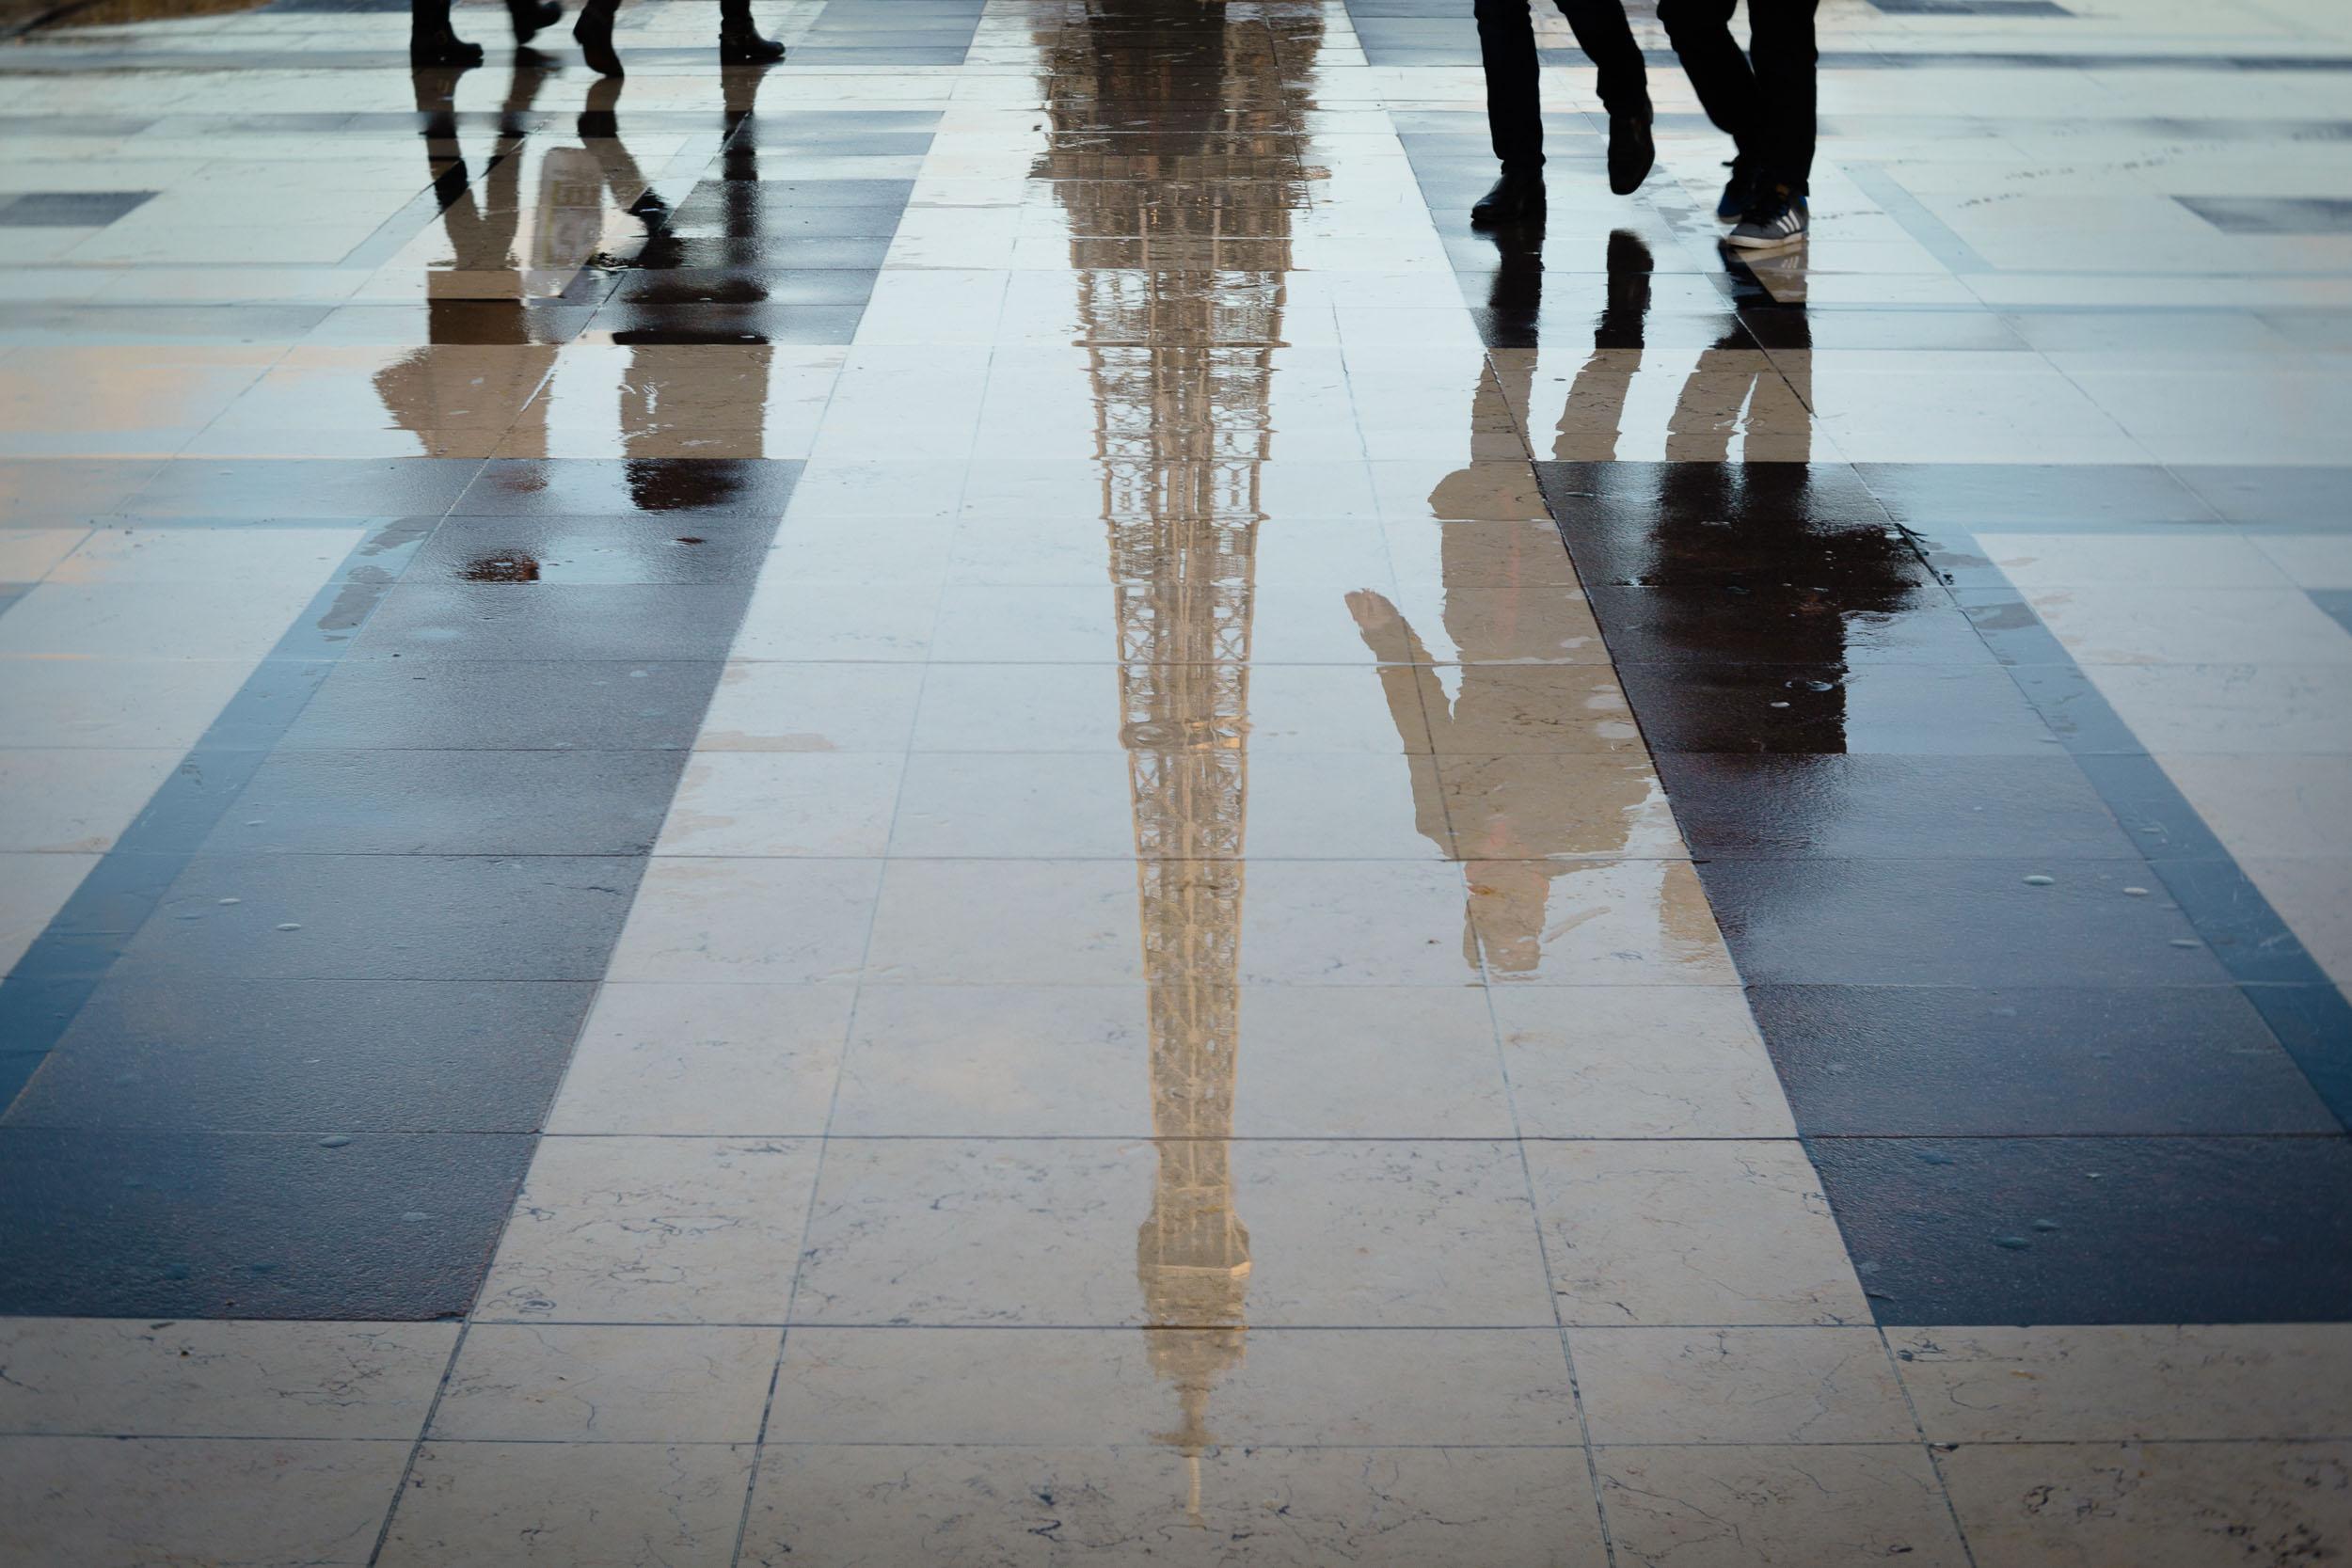 Paris-Trocadero-reflection-Eiffel-Tower-upside-down.jpg